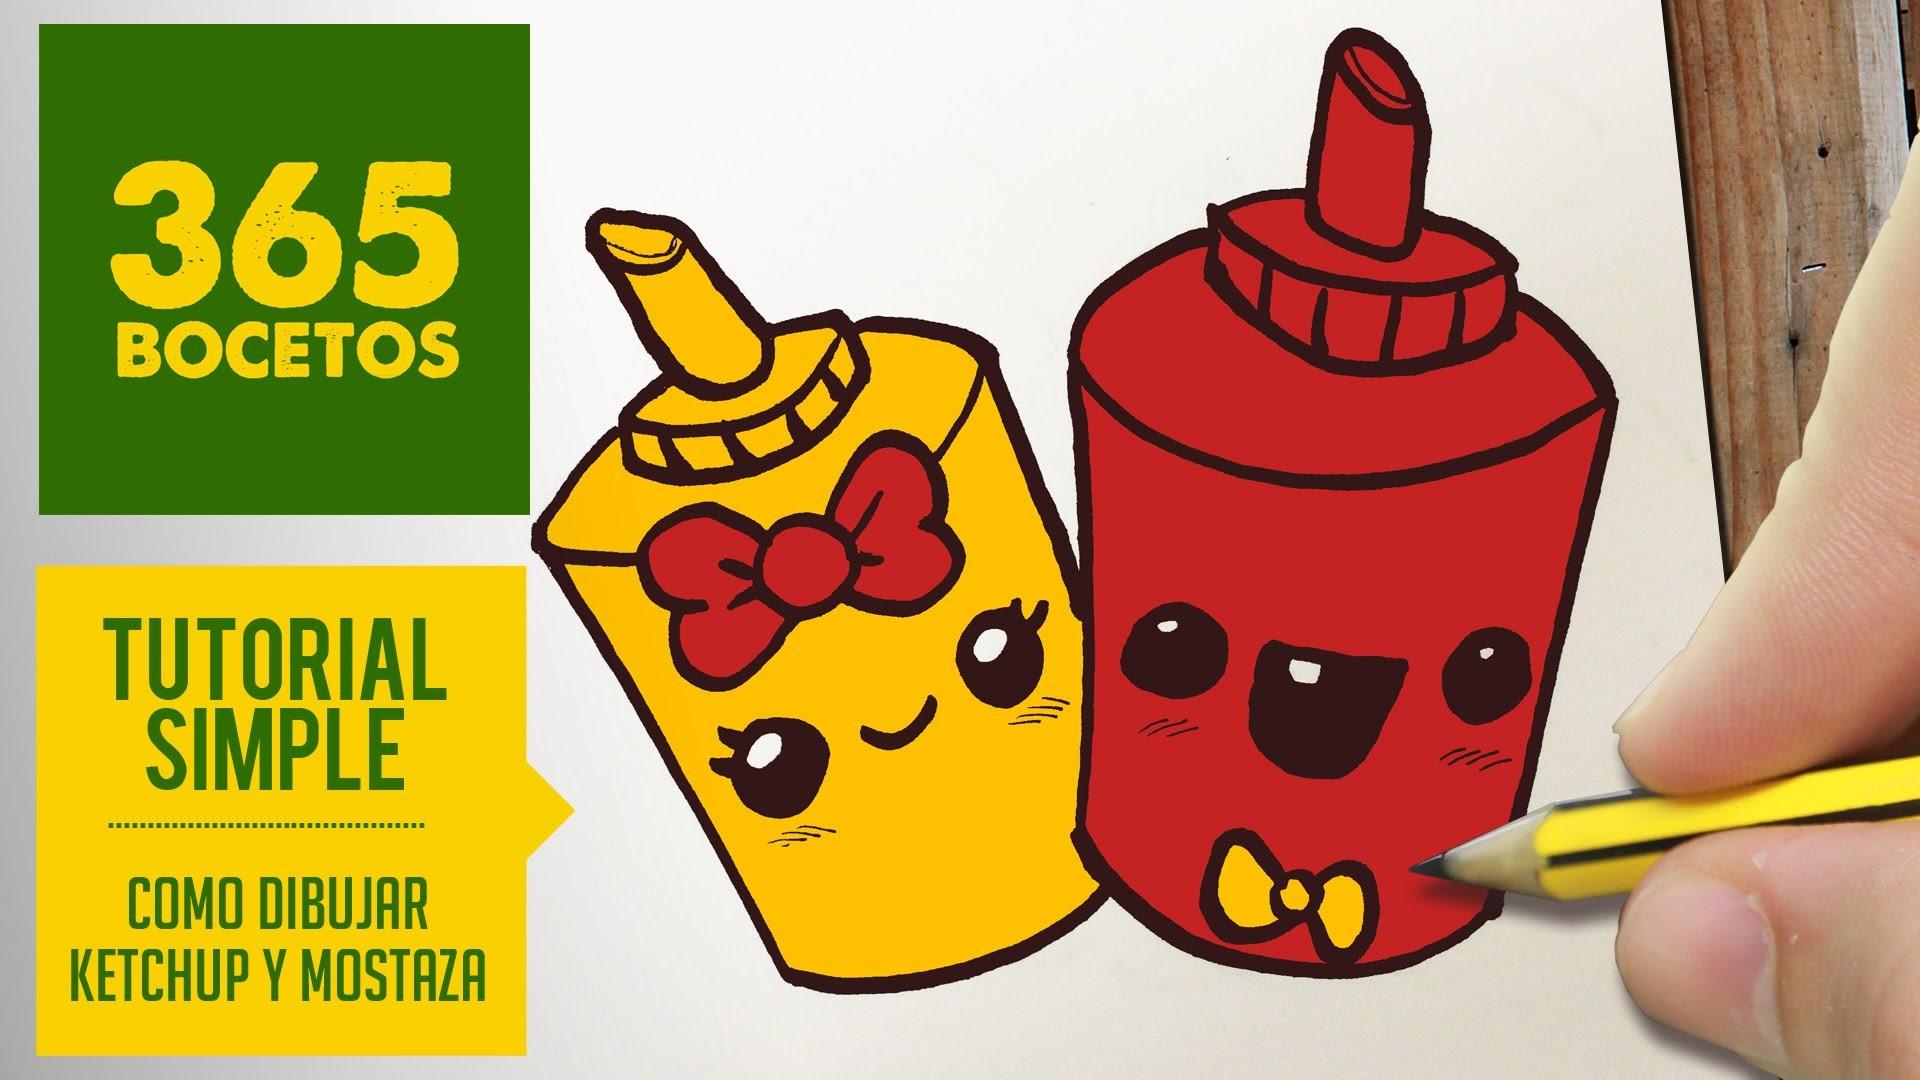 COMO DIBUJAR KETCHUP Y MOSTAZA KAWAII PASO A PASO - Dibujos kawaii faciles - How to draw a ketchup